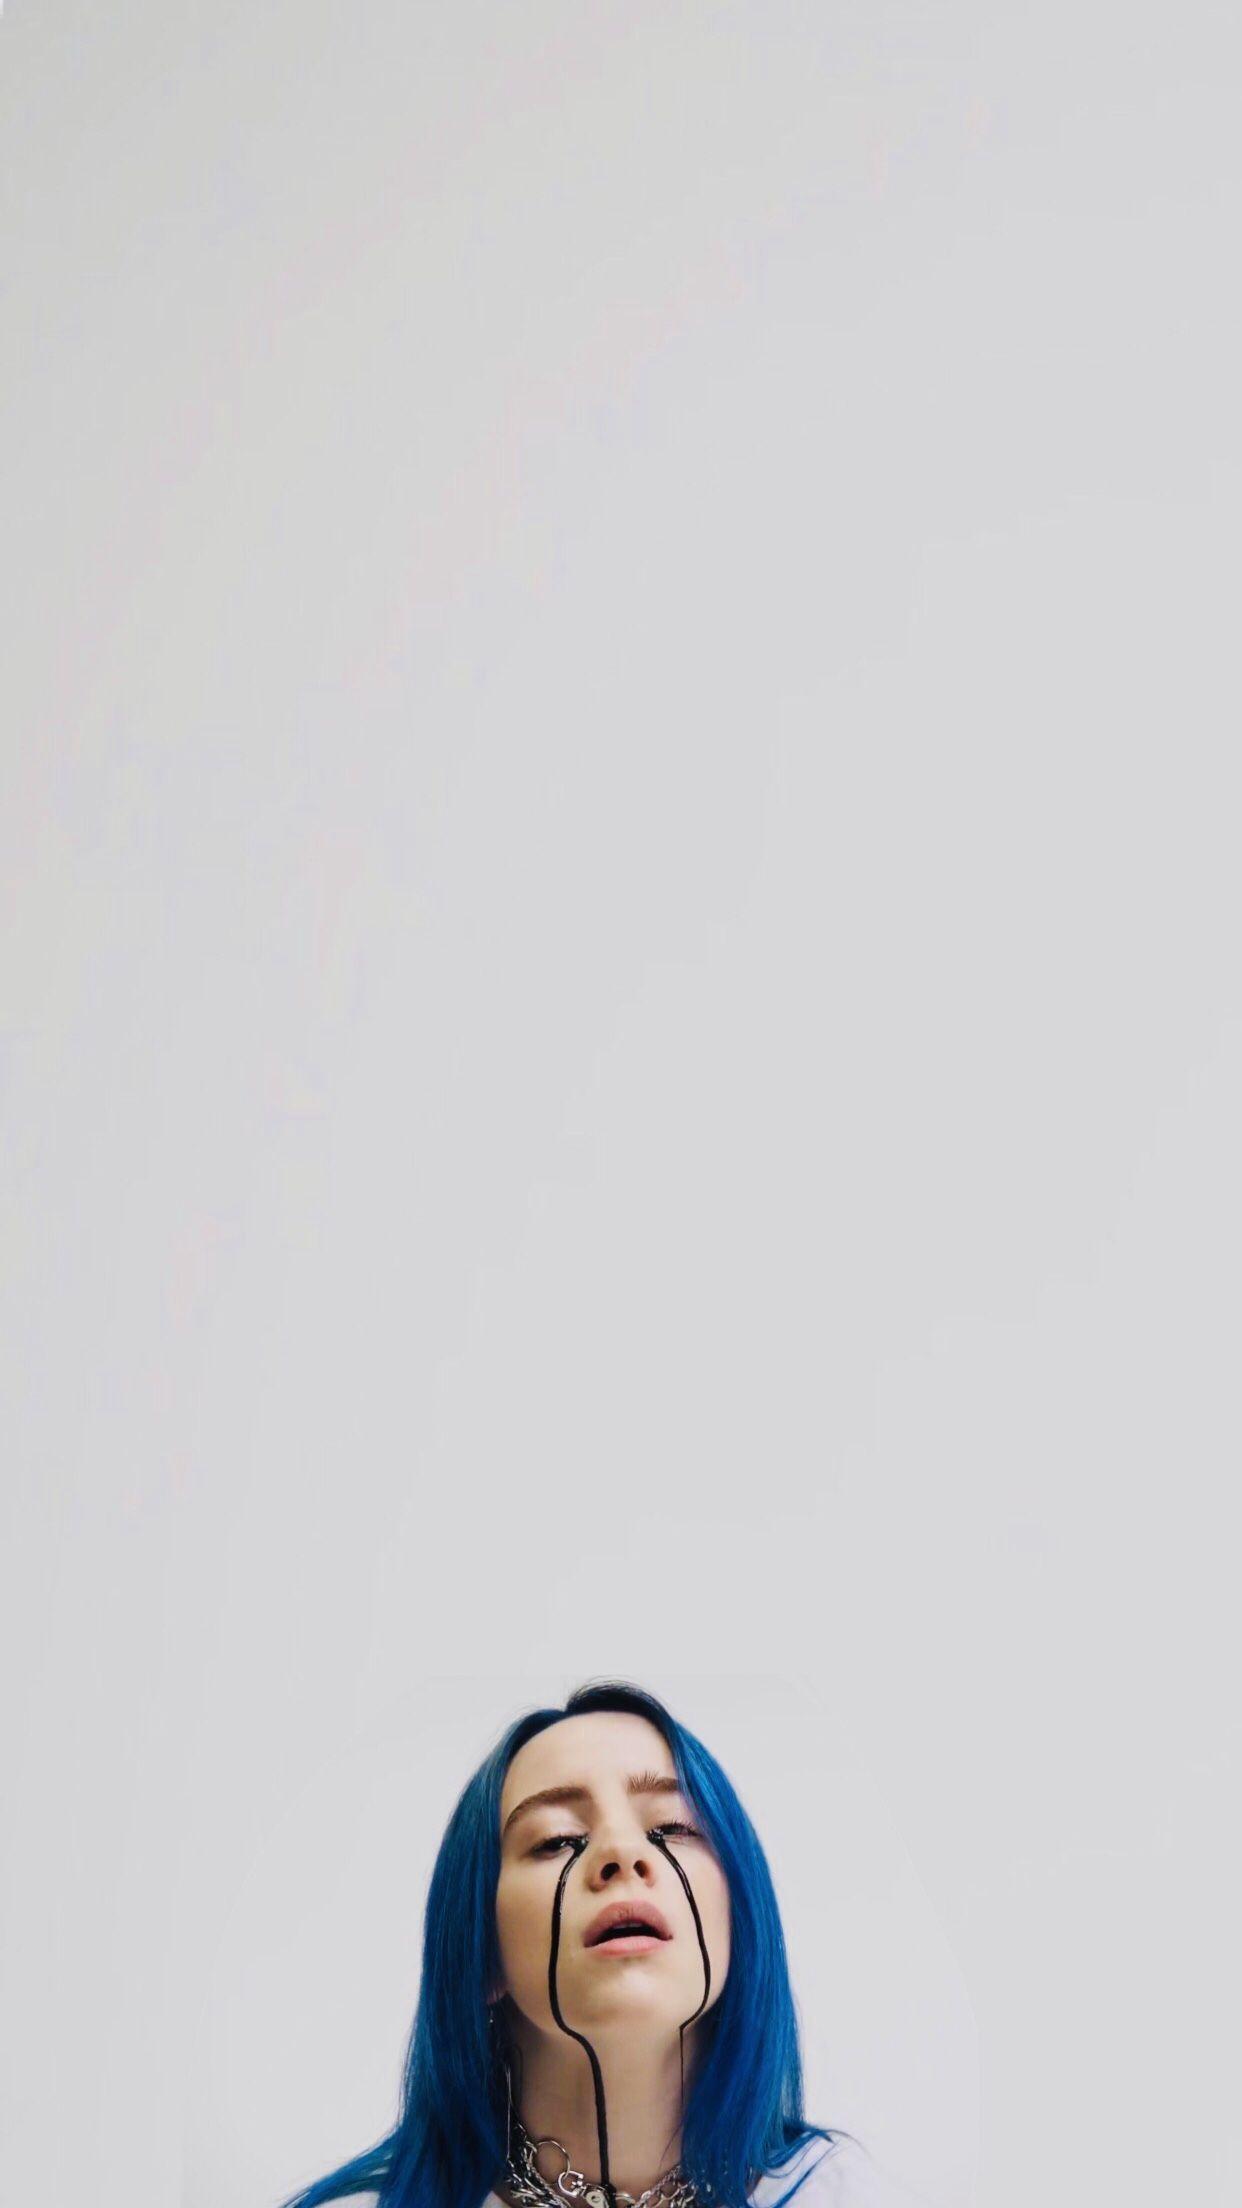 Billie Eilish Creepy Wallpaper For Iphone Android New 2019 Billie Billie Eilish Icon